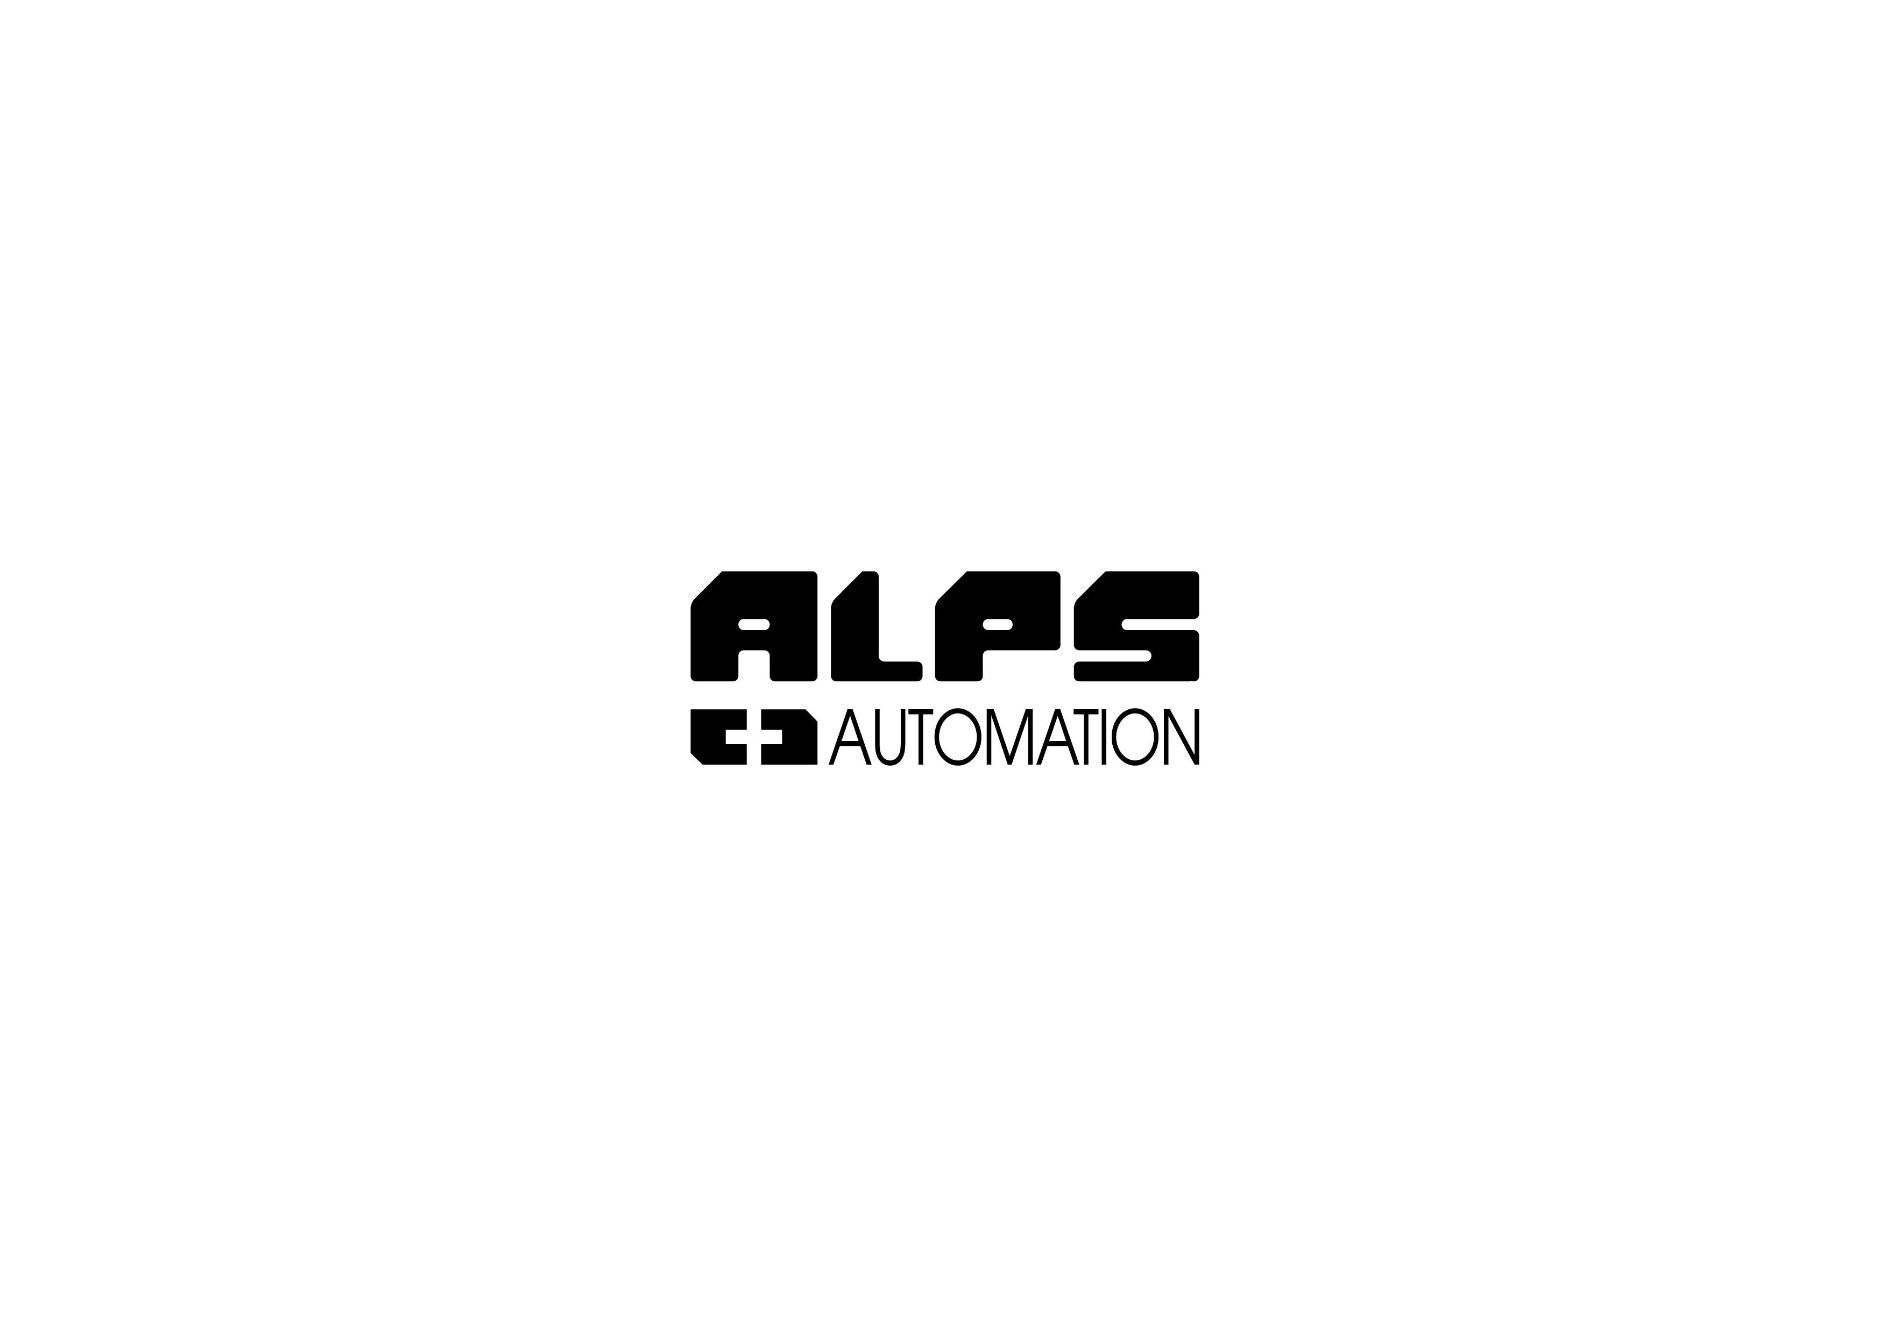 ALPS AUTOMATION